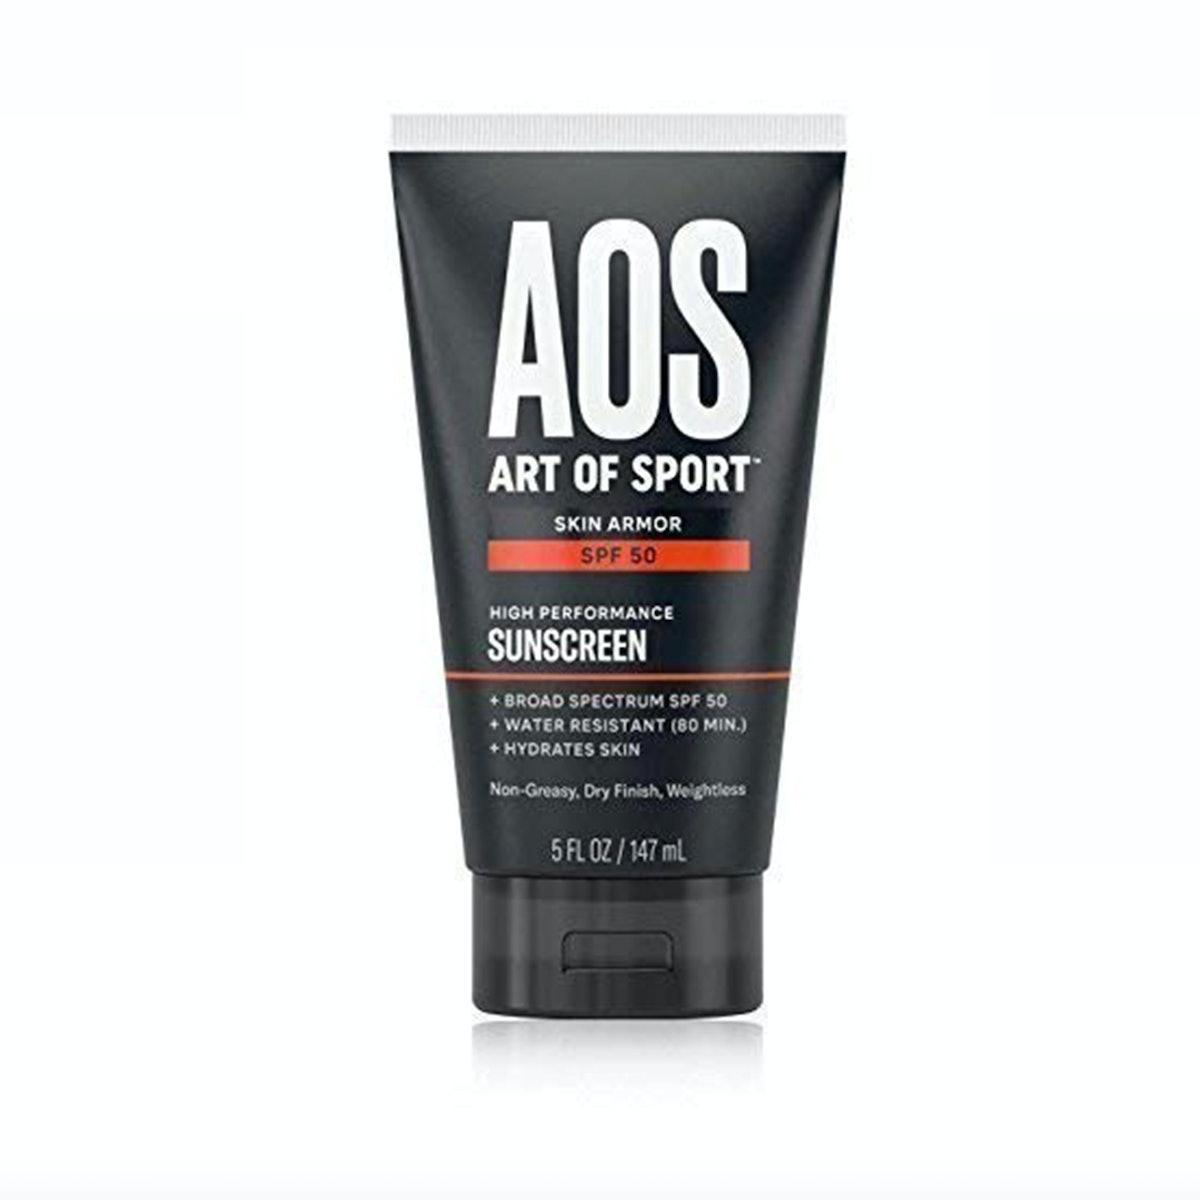 Art of Sport Skin Armor Sunscreen